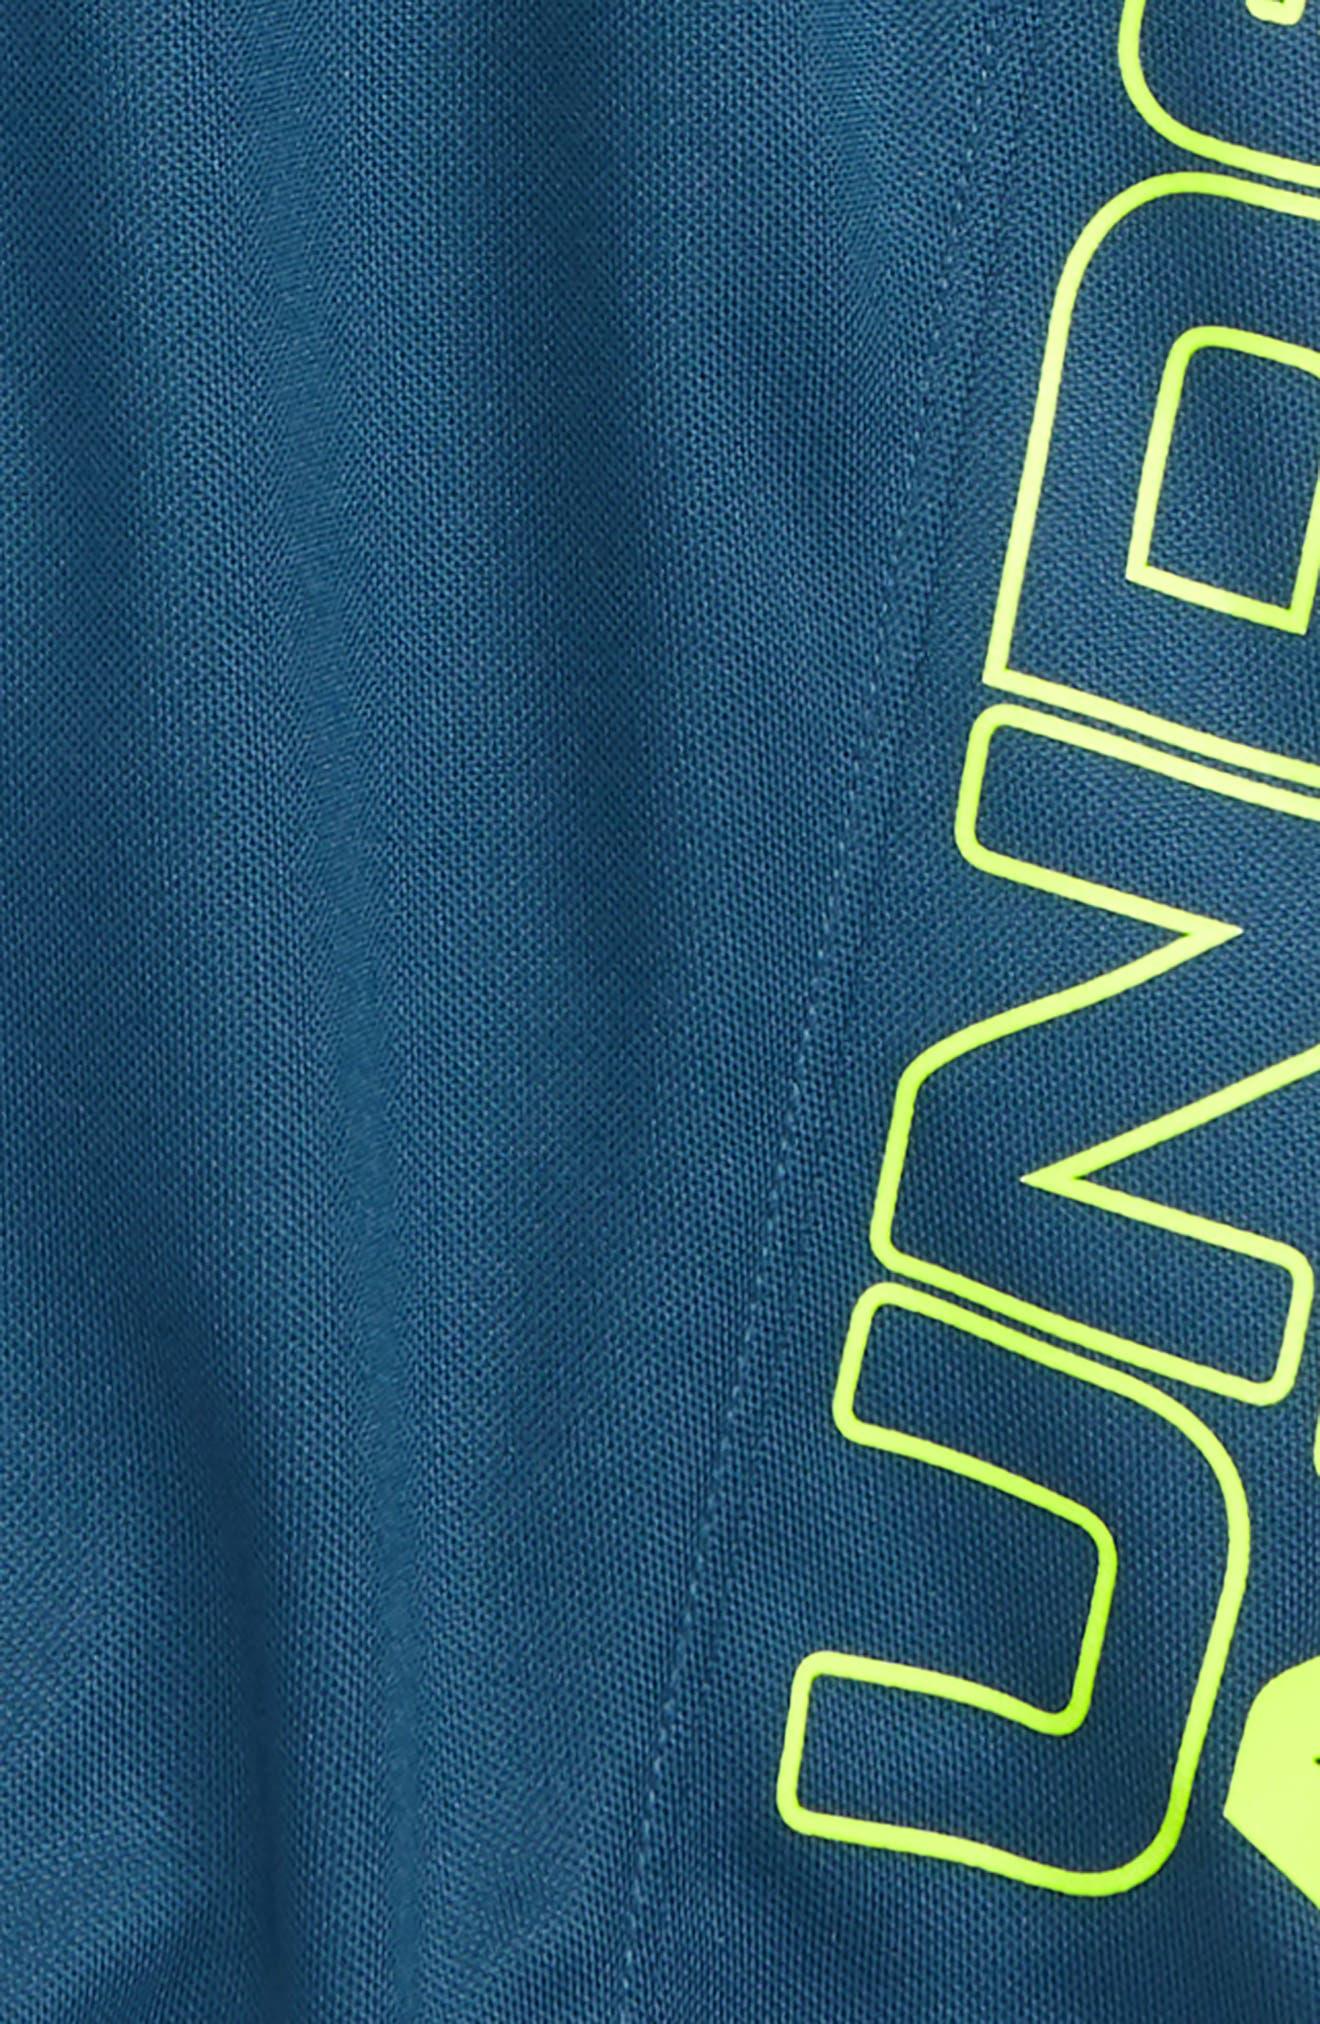 UNDER ARMOUR,                             Kick Off HeatGear<sup>®</sup> Athletic Shorts,                             Alternate thumbnail 2, color,                             PETROL BLUE